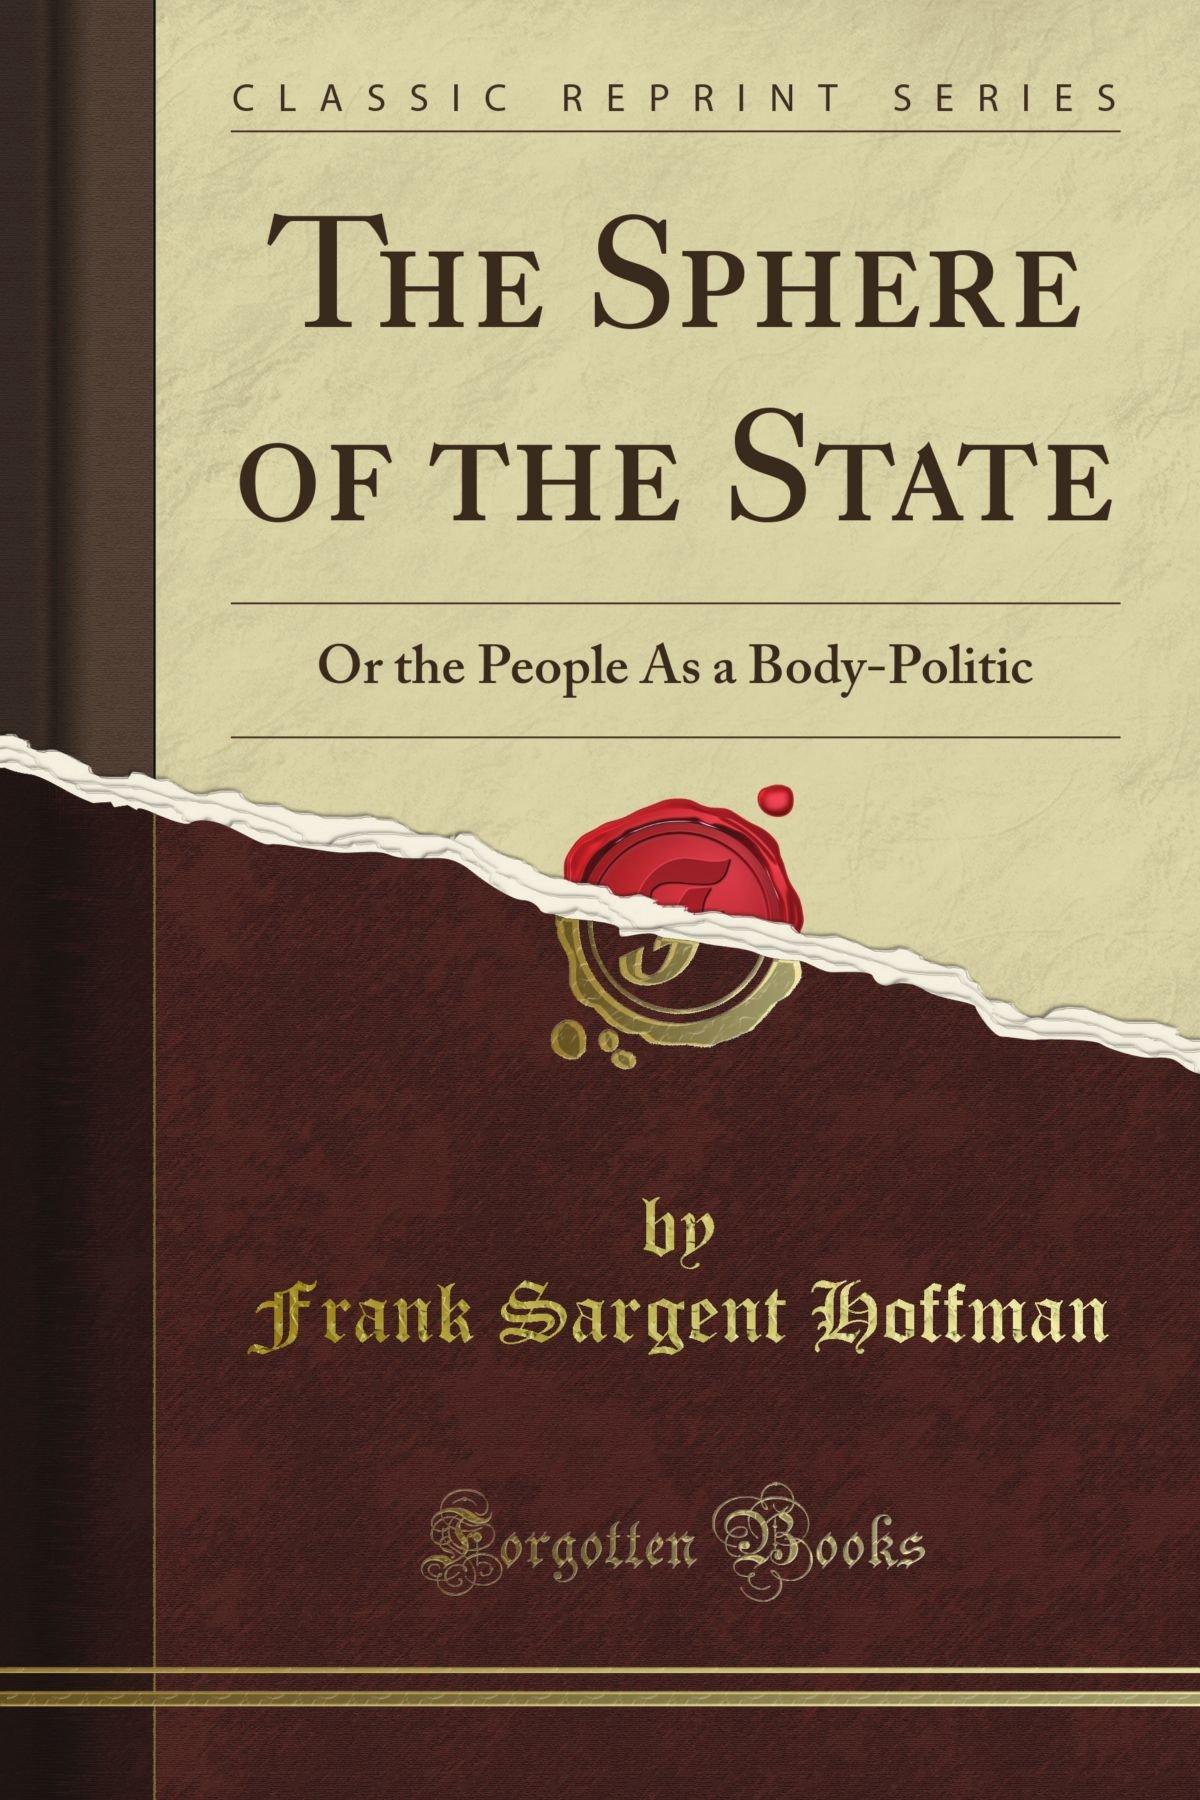 Diplomacy: The Art of Persuasion PDF ePub ebook